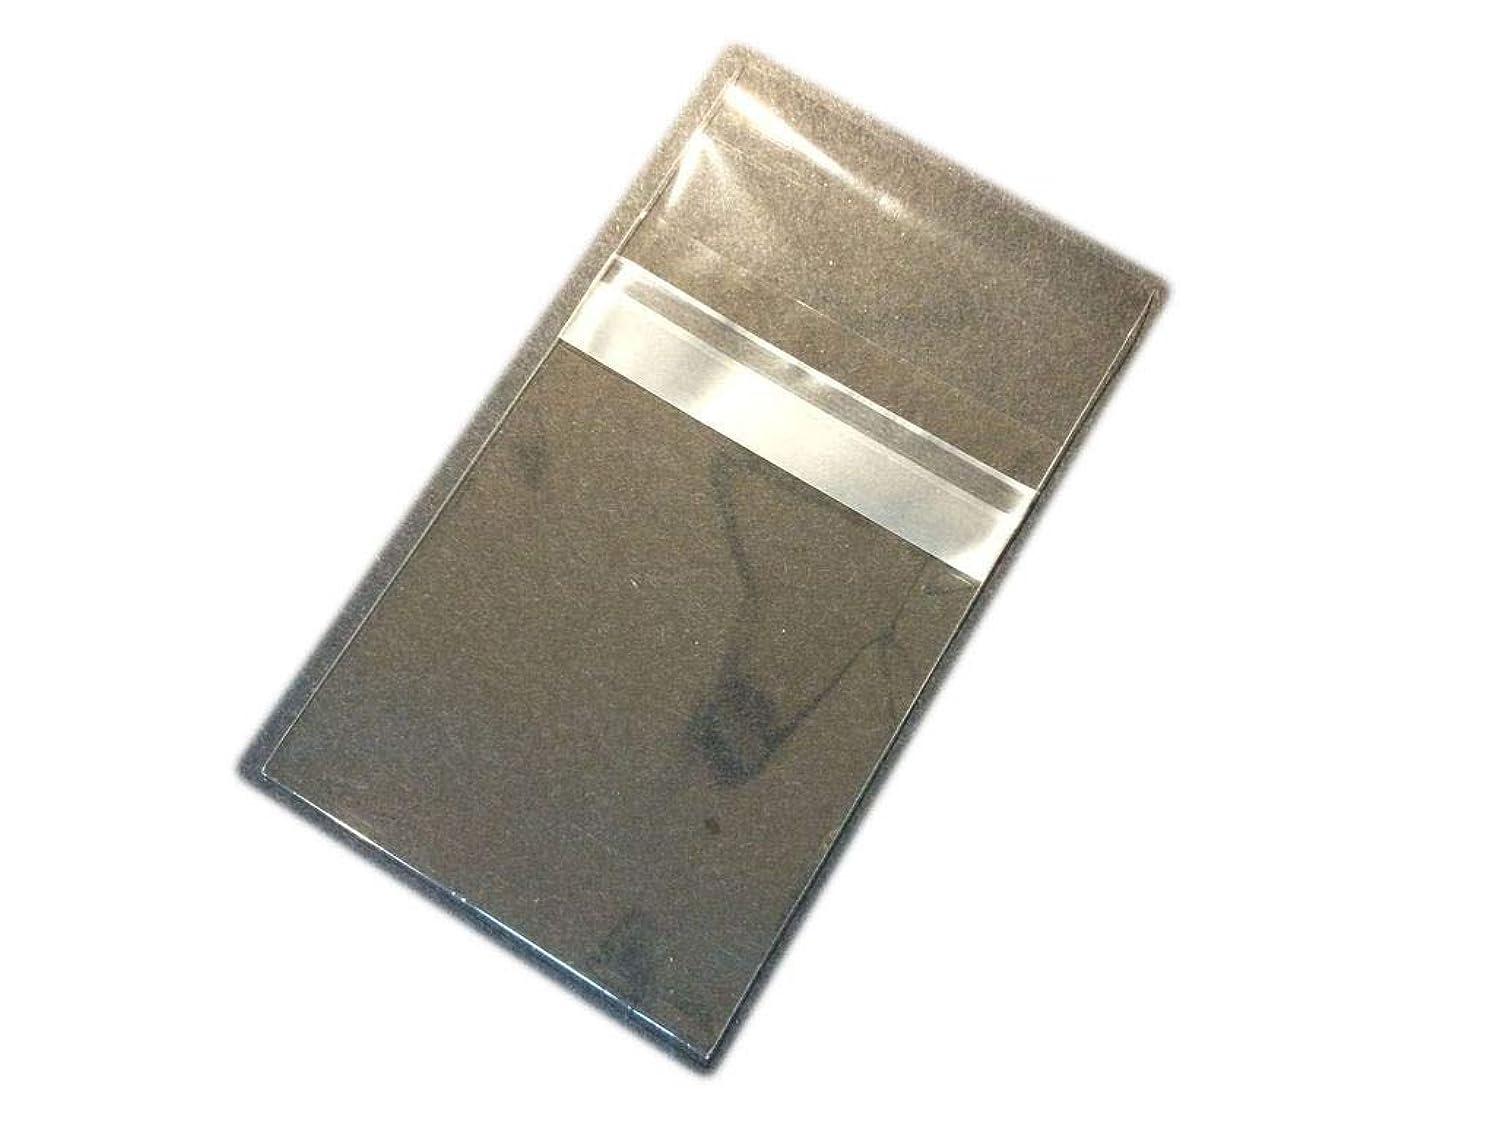 UNIQUEPACKING 100 Pcs 4 5/16 X 9 3/4 (P) Clear #10 Business Envelopes Cello Bags - Tape Strip on Body